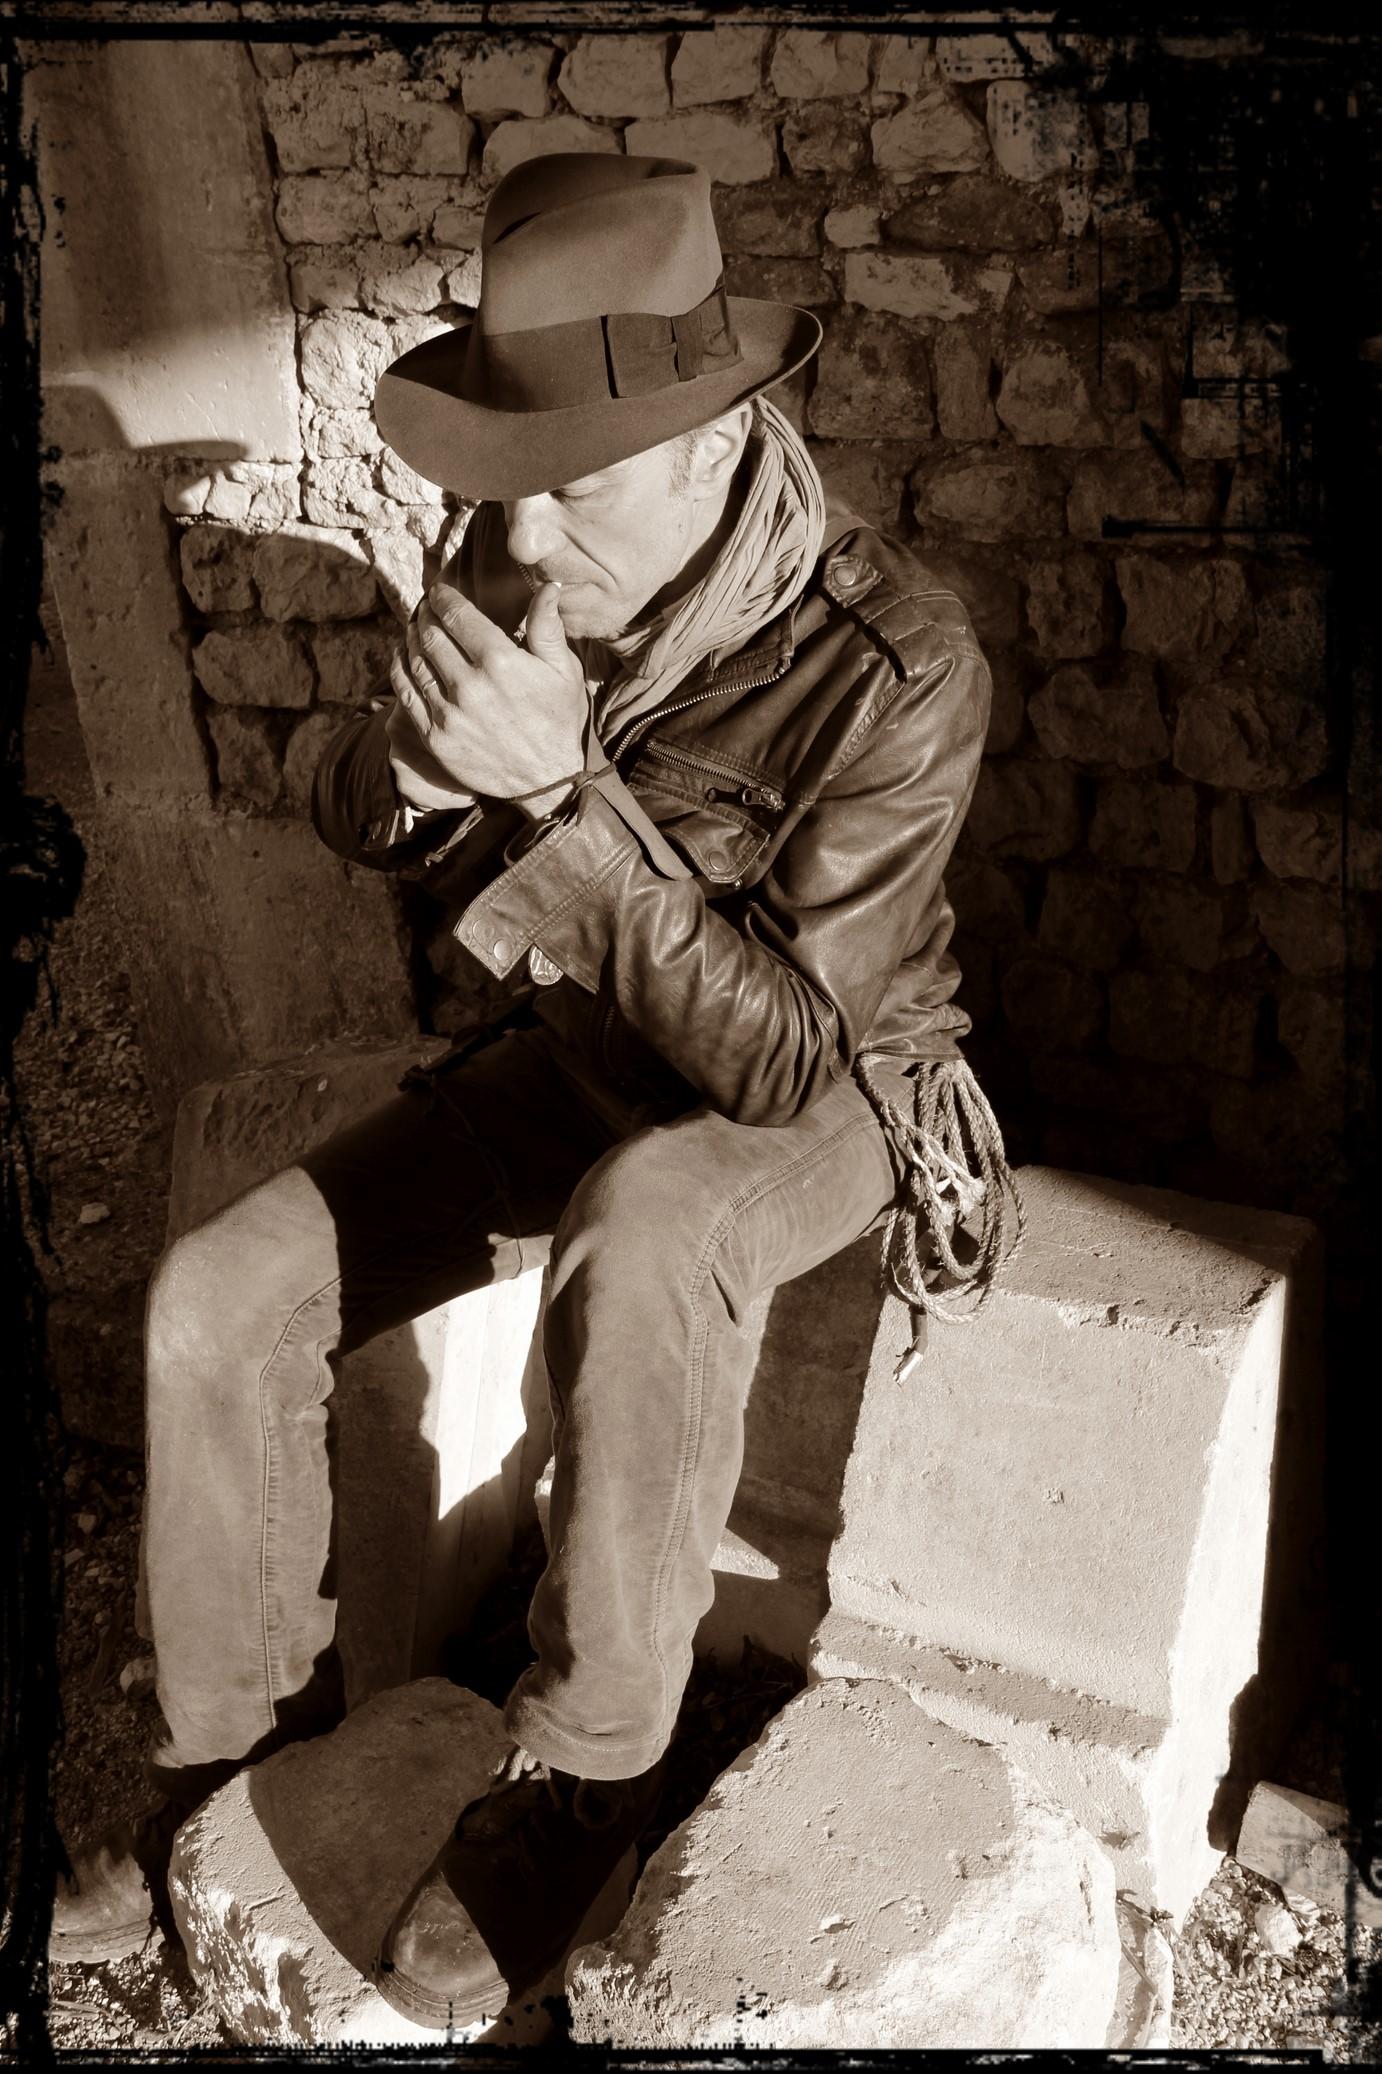 Jérémy Jones-Fin de l'aventure